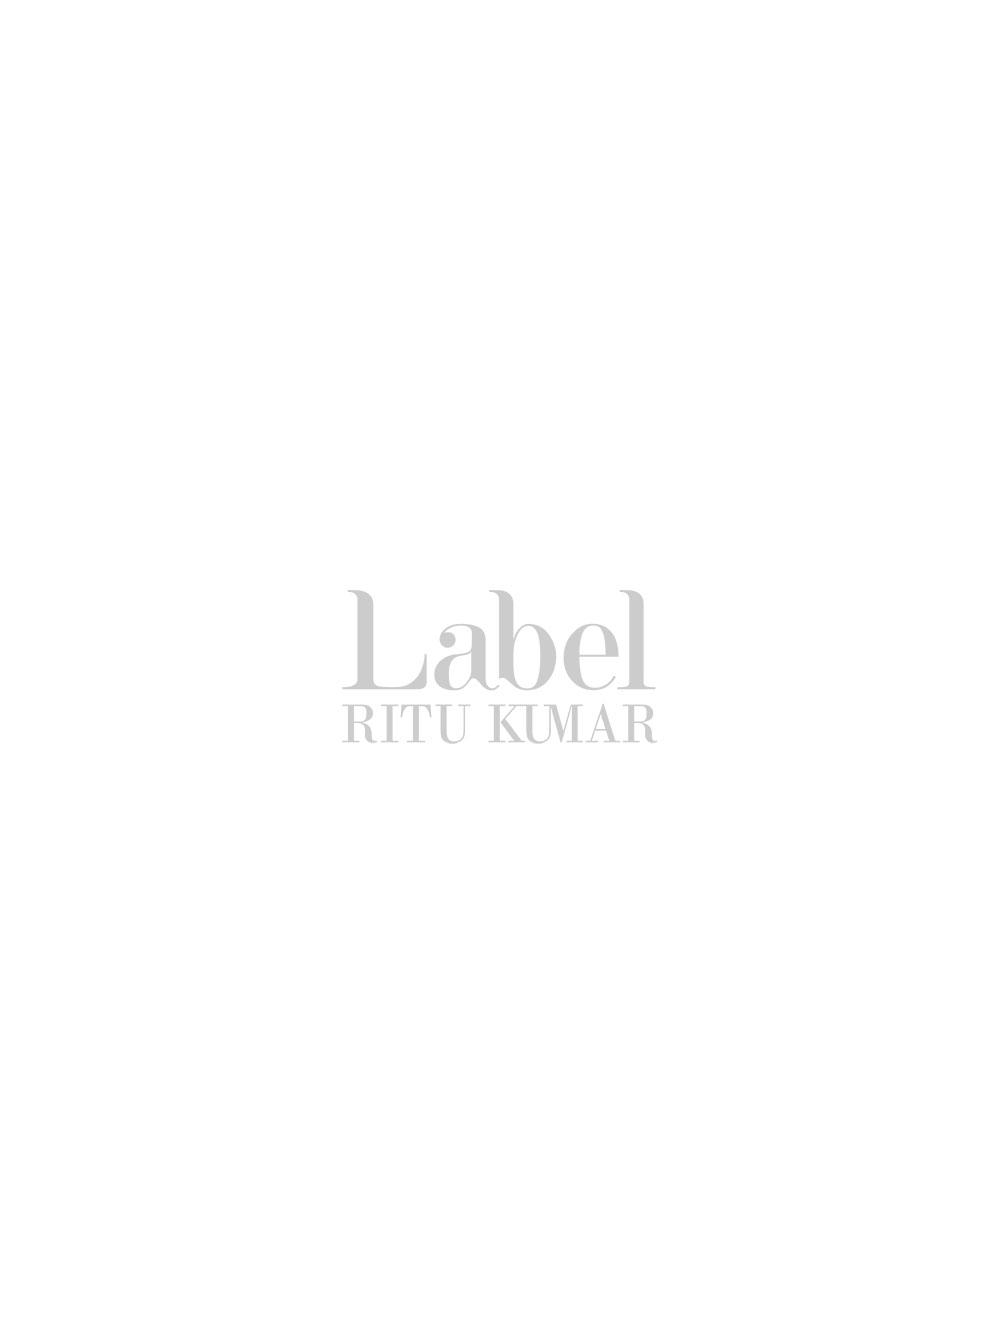 Tribal Printed Tunic Top by Label Ritu Kumar